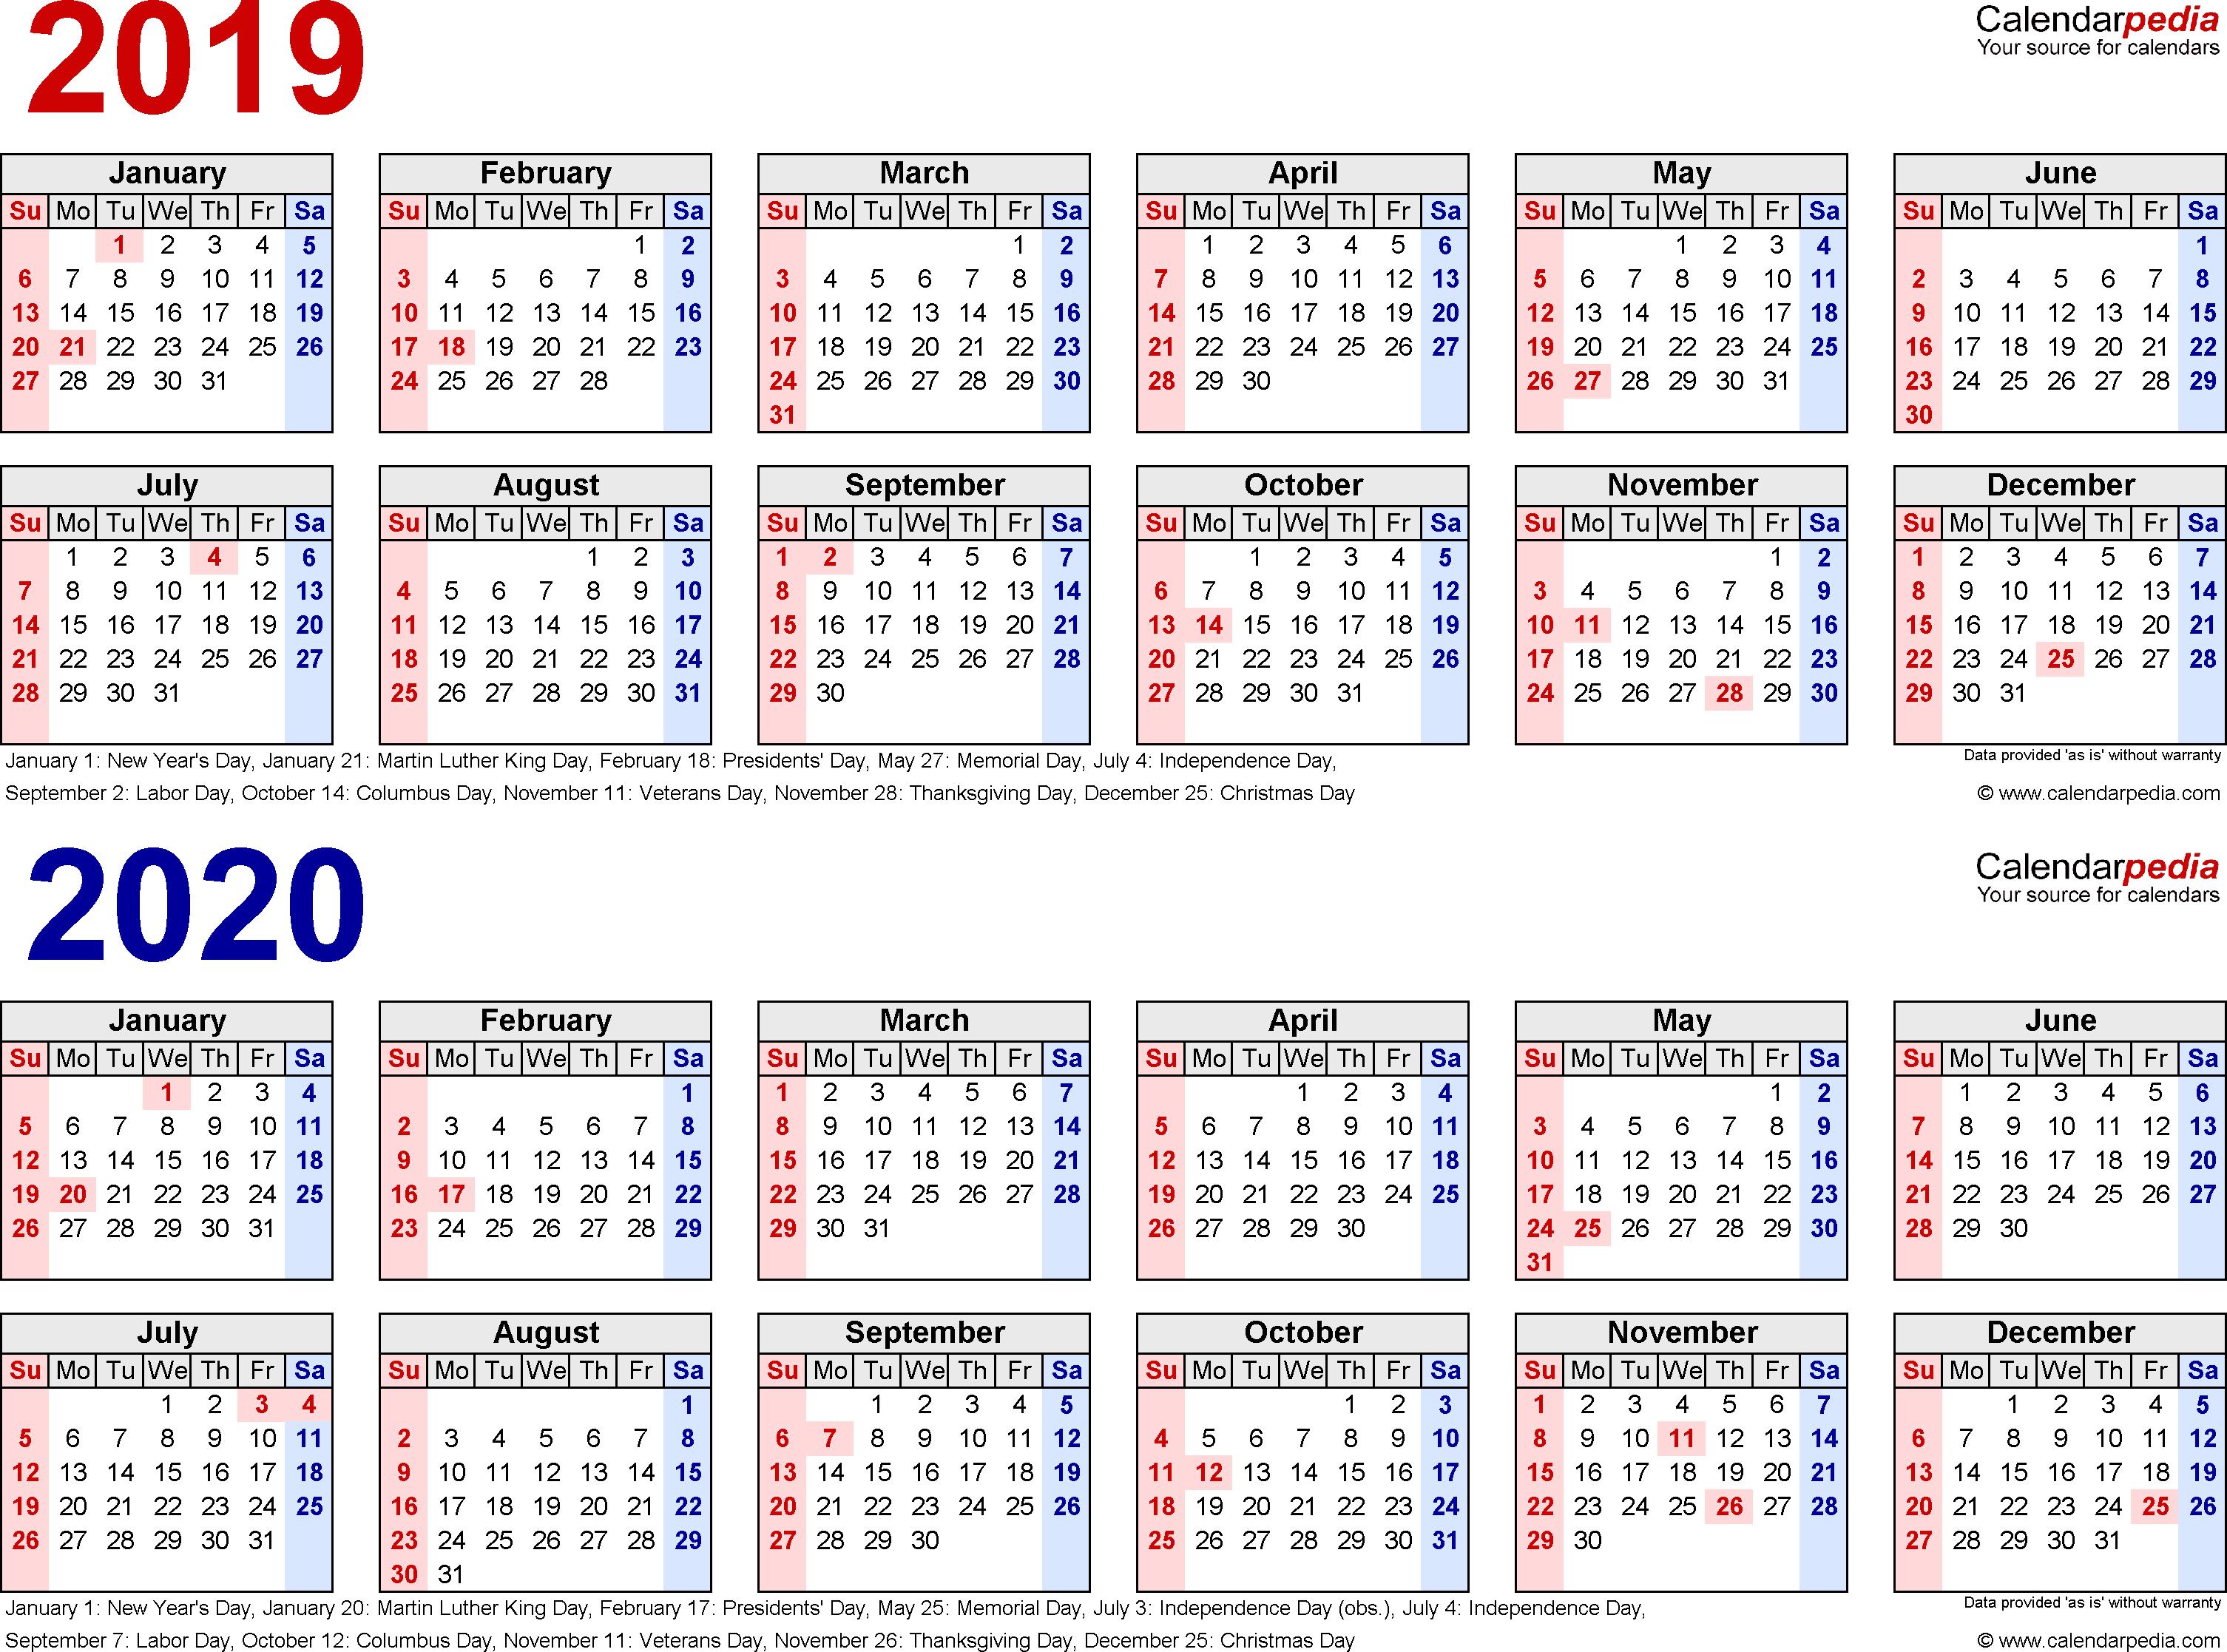 2019-2020 Calendar - Free Printable Two-Year Pdf Calendars inside Google Calendar Printable 2019 2020